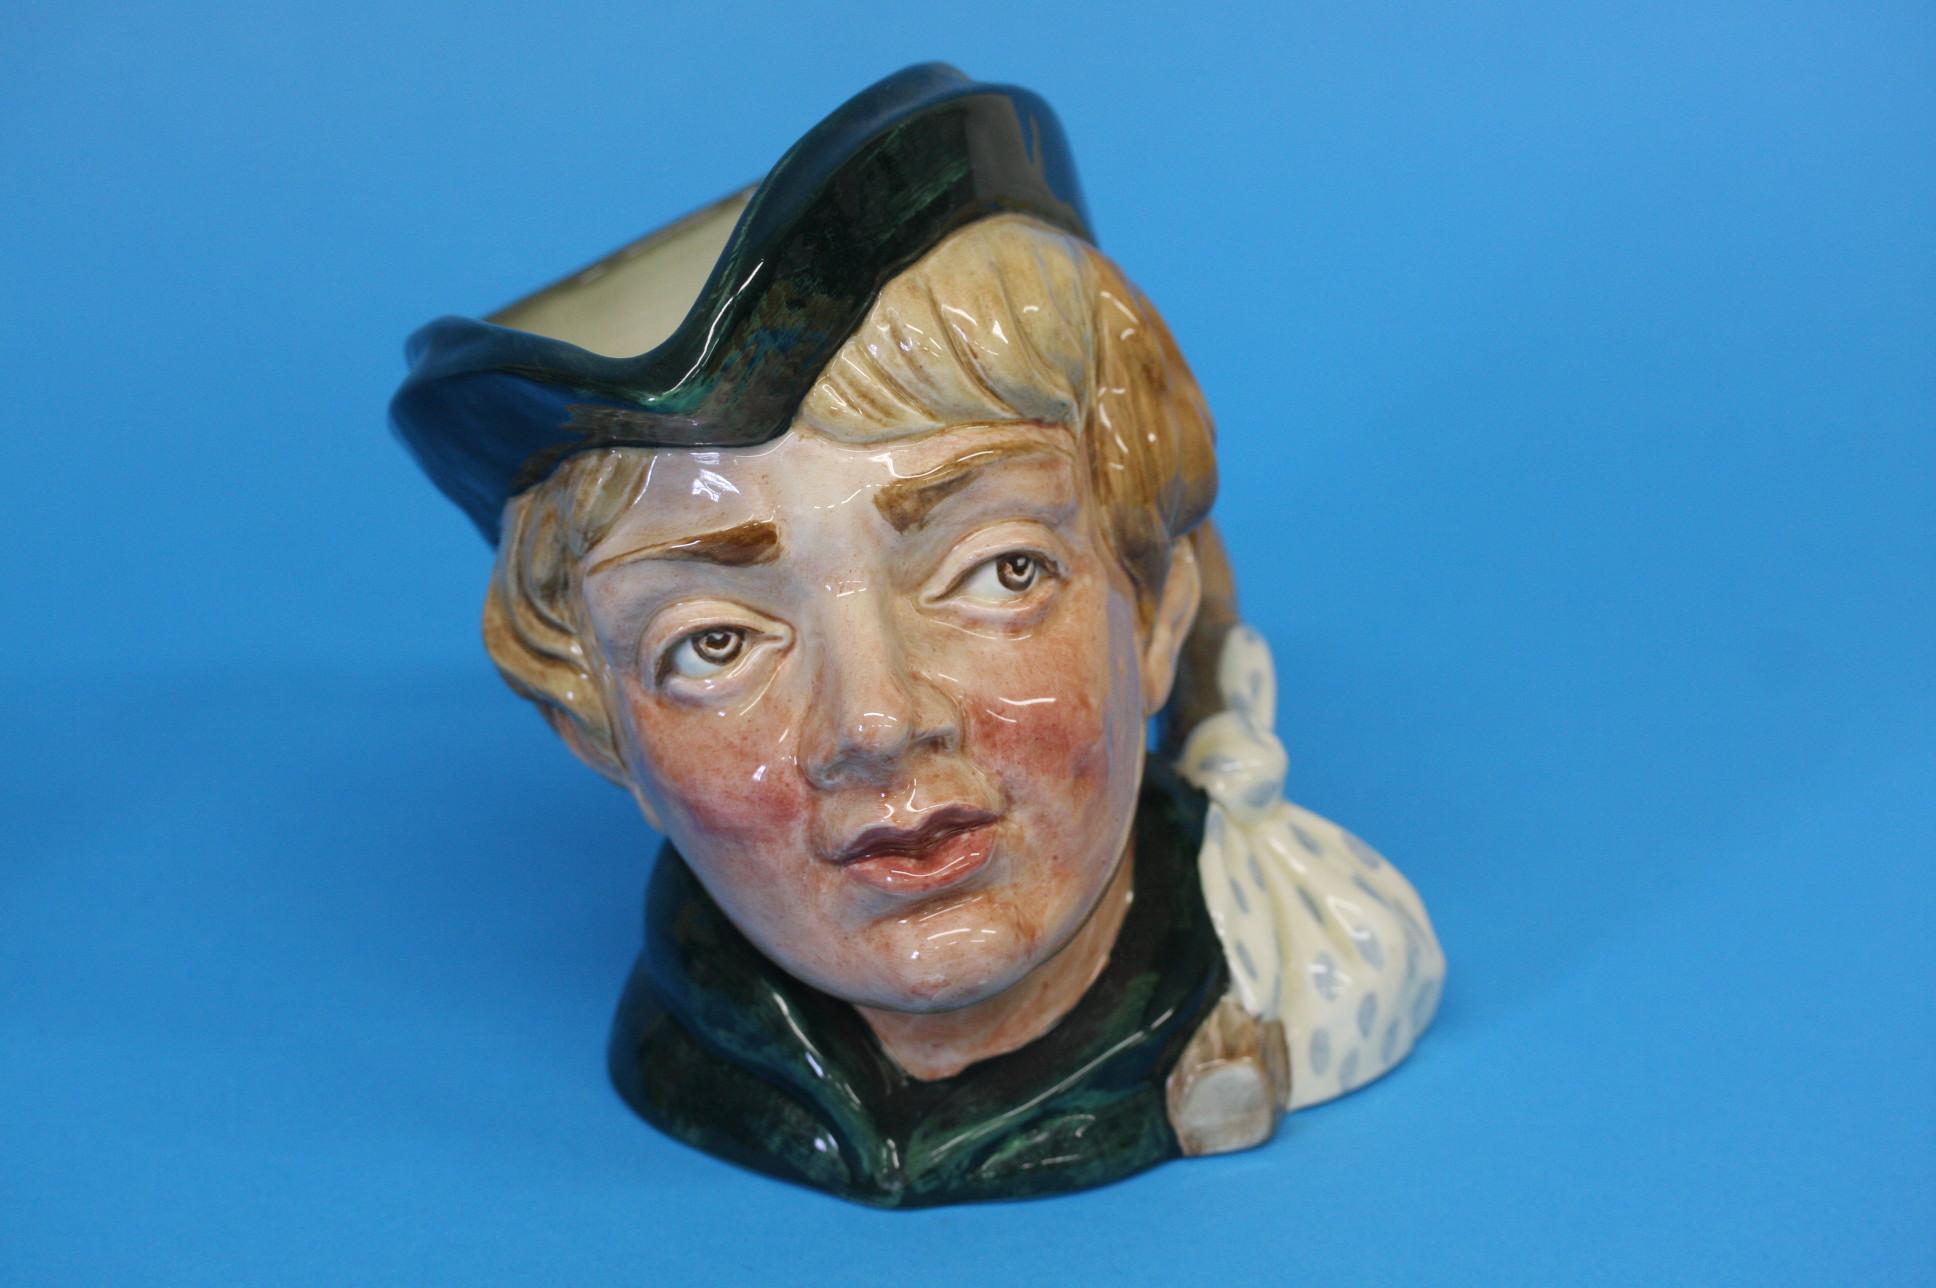 A Royal Doulton Character jug 'Dick Whittington' a - Image 3 of 3